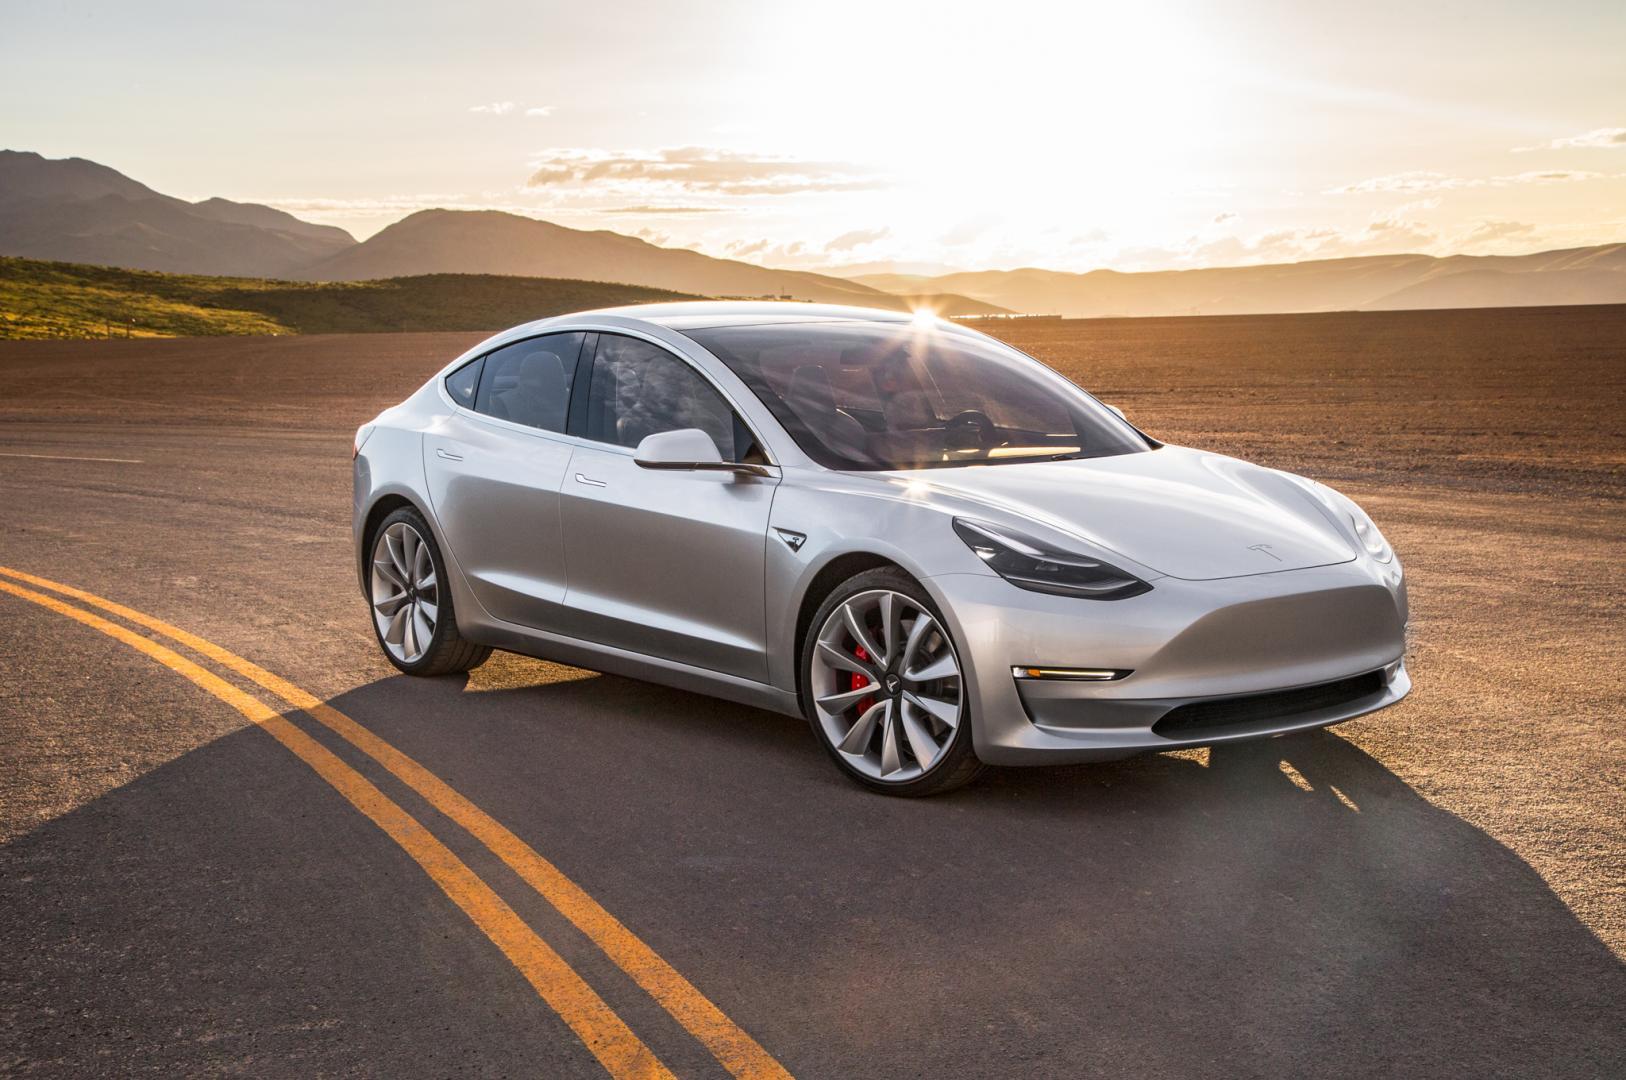 Tesla Model 3 Elon Musk vraagt om geld